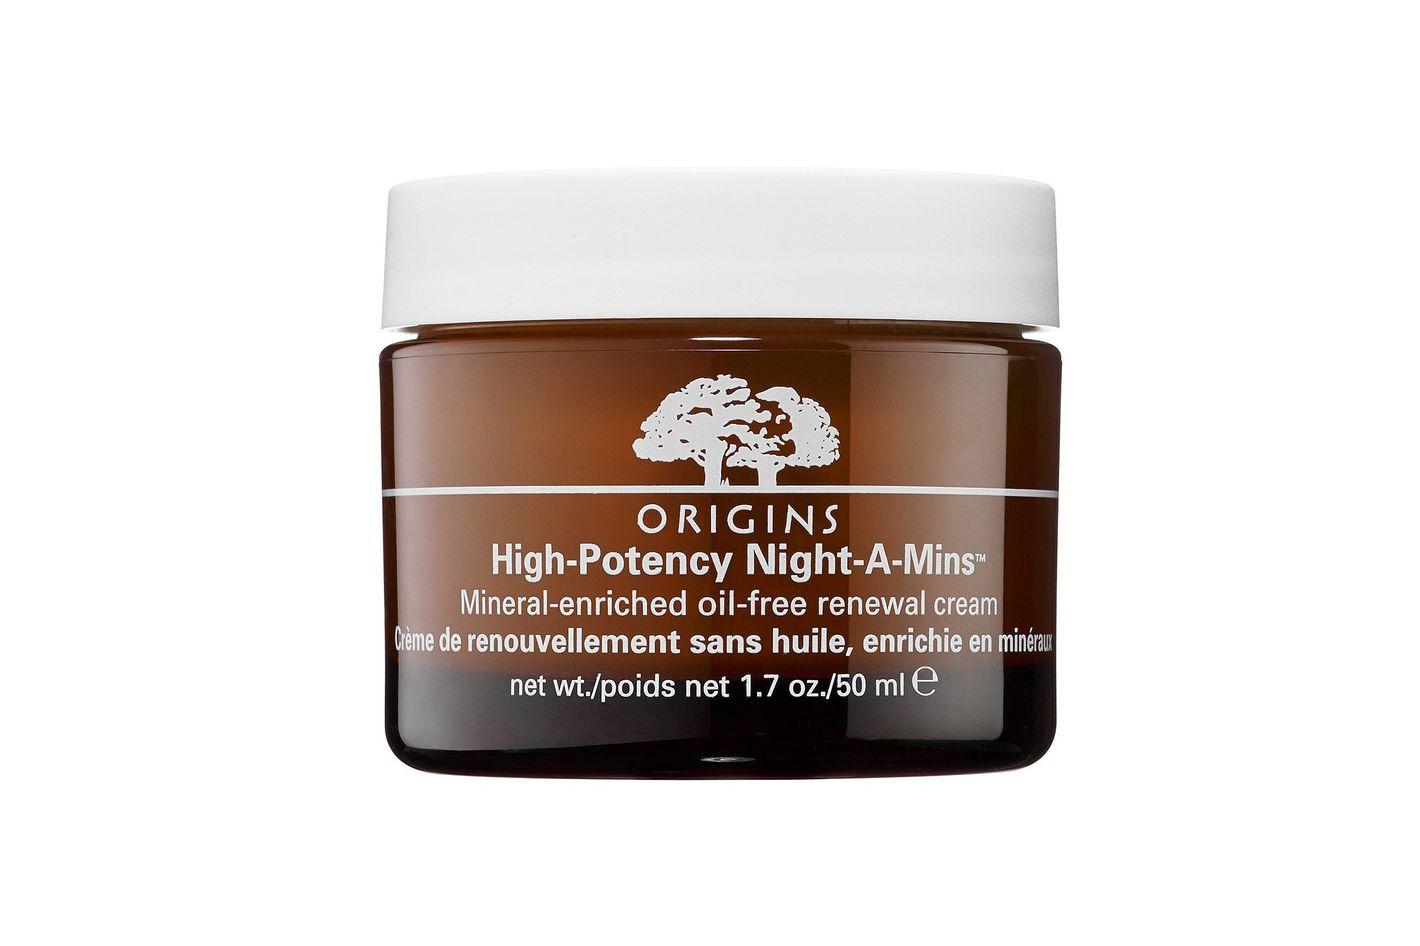 Origins High Potency Night-A-Mins Cream